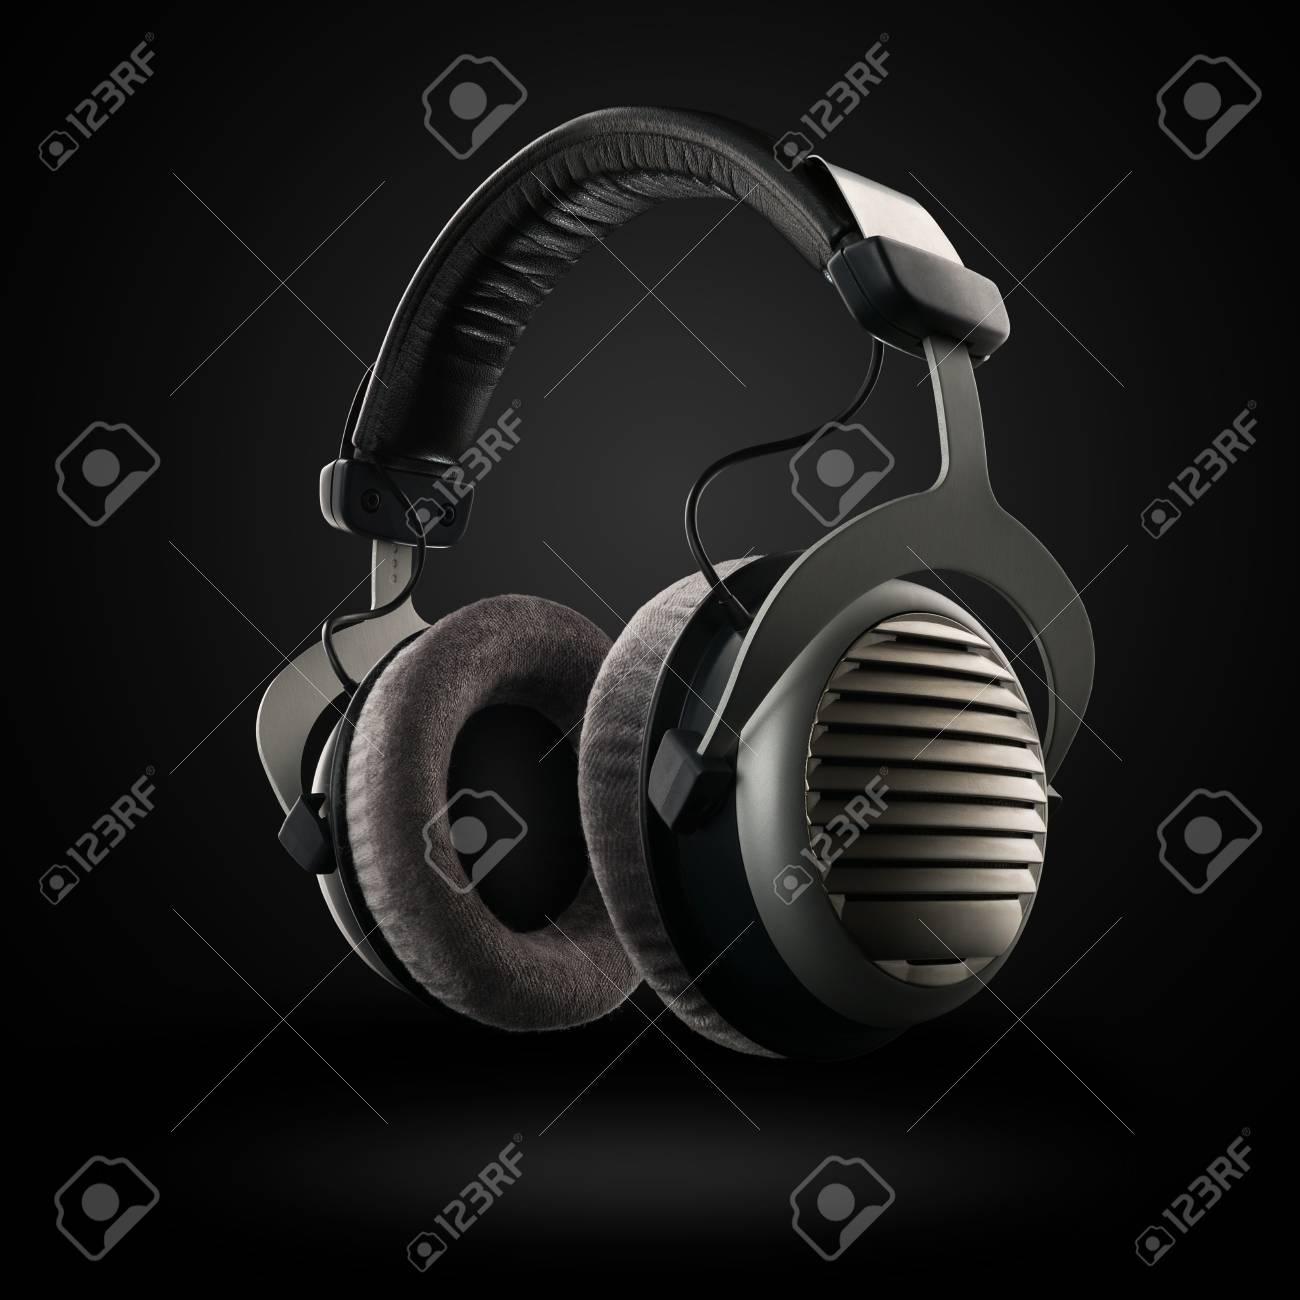 headphones on the black background - 52852870